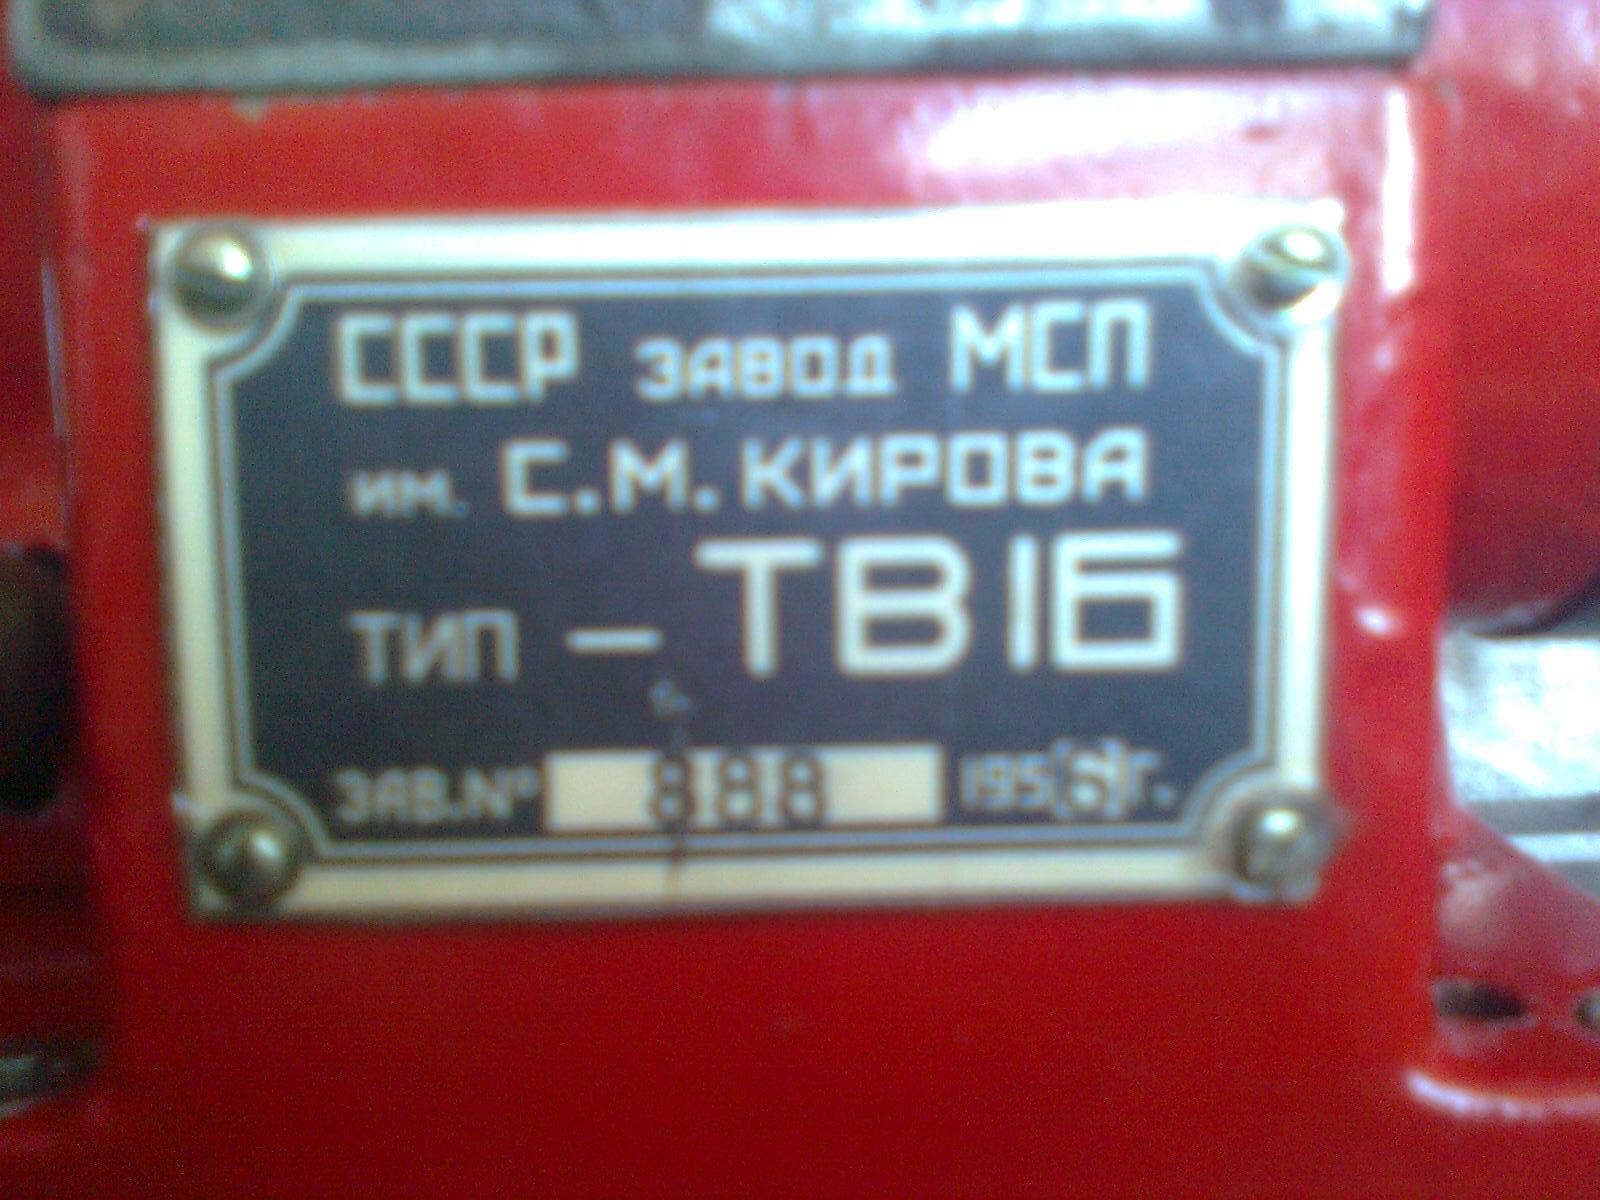 ТВ-16 Алма-Атинский на подшипниках